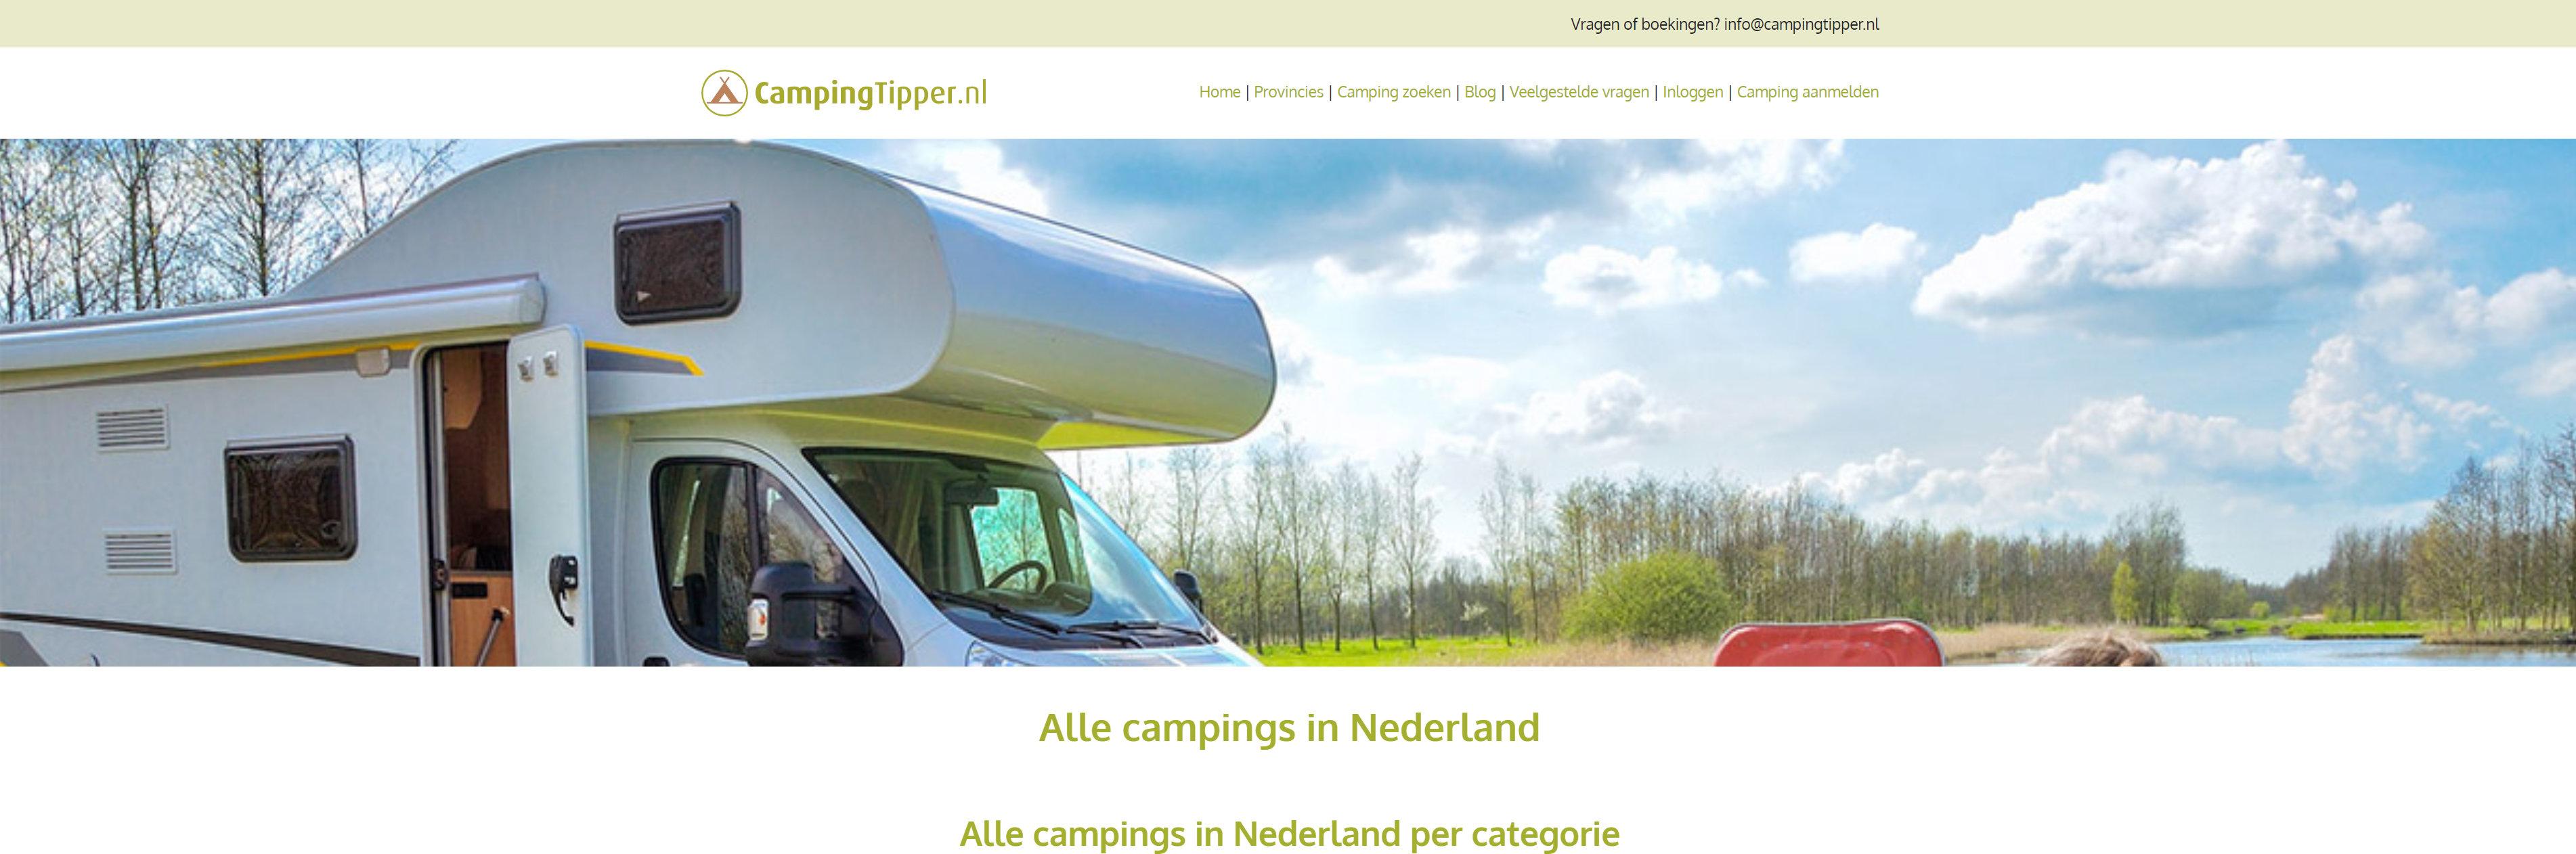 campingtipper.nl